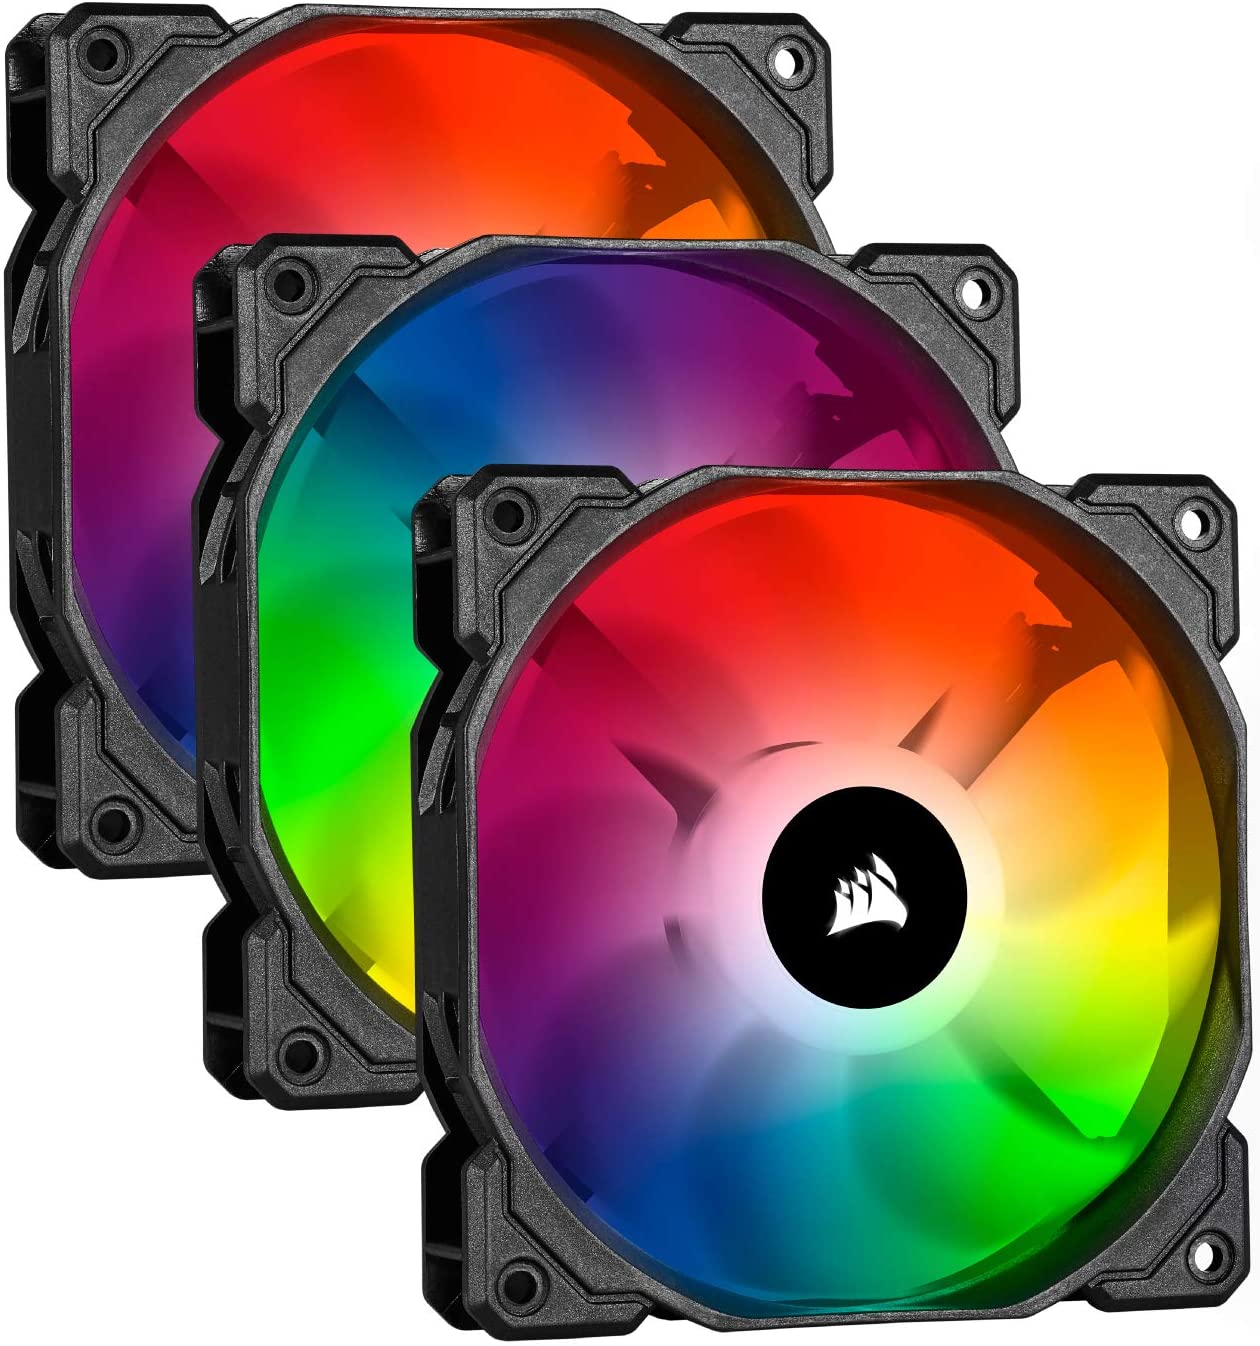 Tres ventiladores Corsair iCUE SP120 RGB PRO